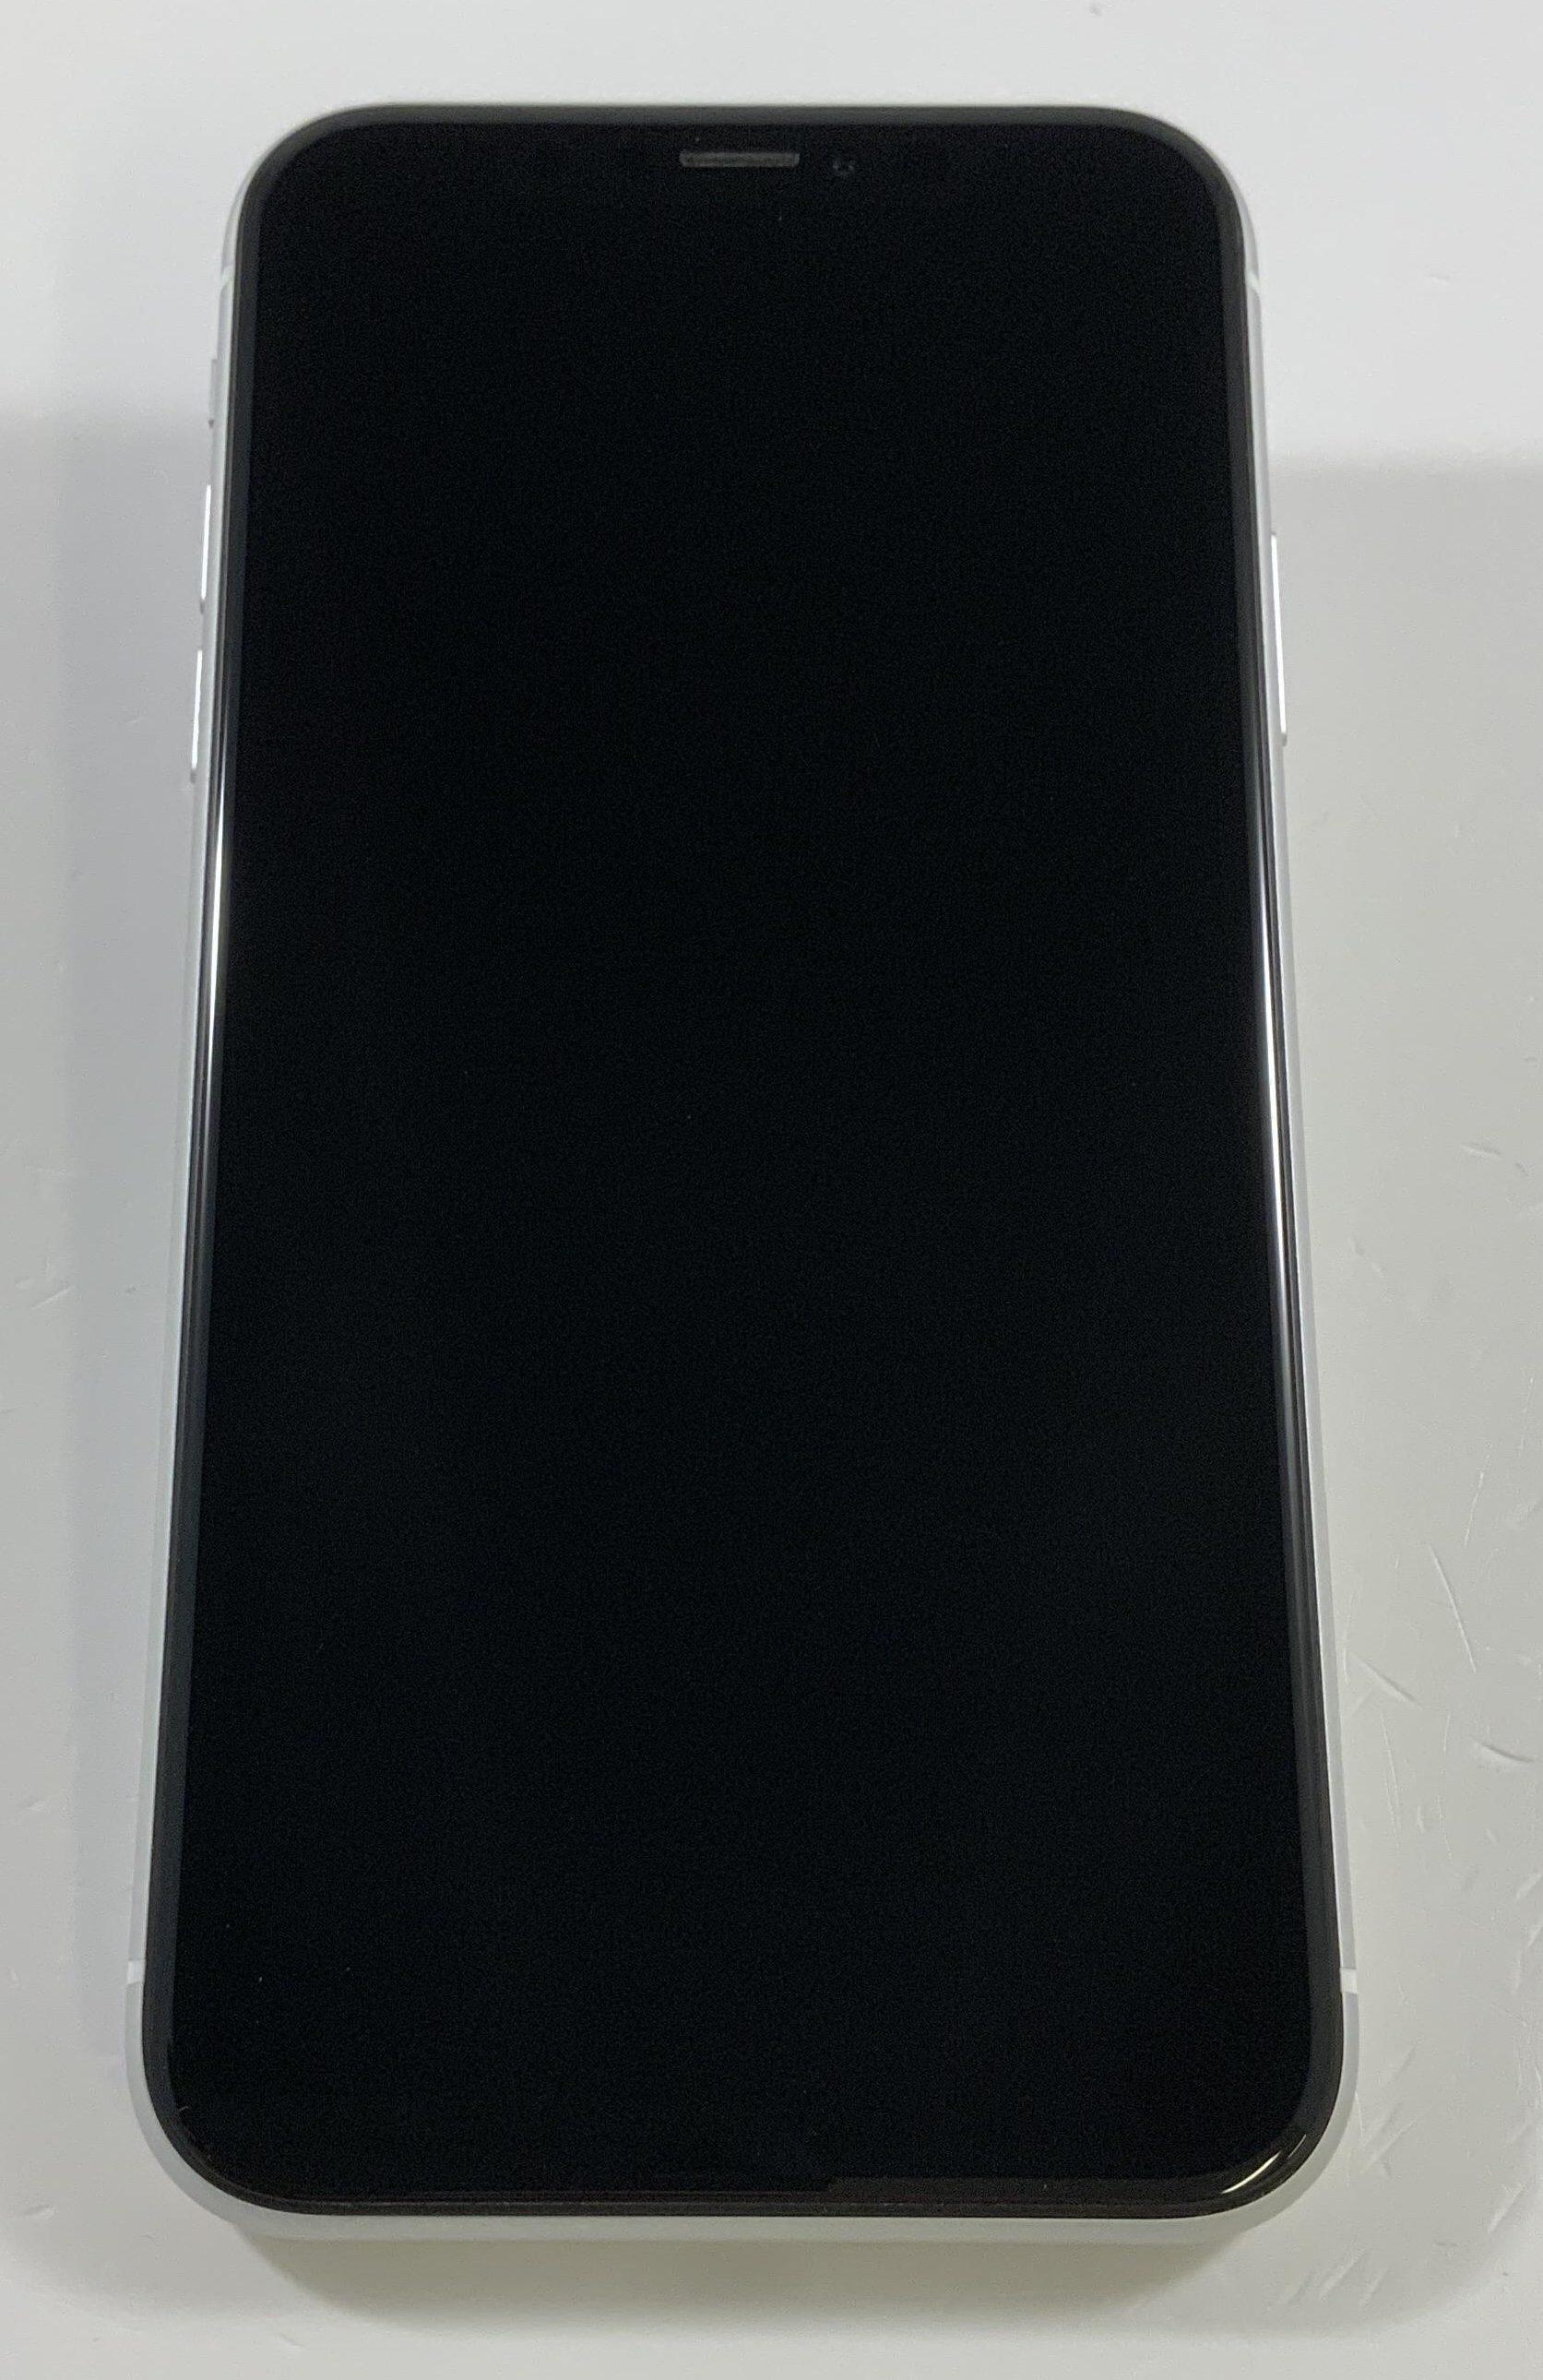 iPhone XR 64GB, 64GB, White, Afbeelding 1